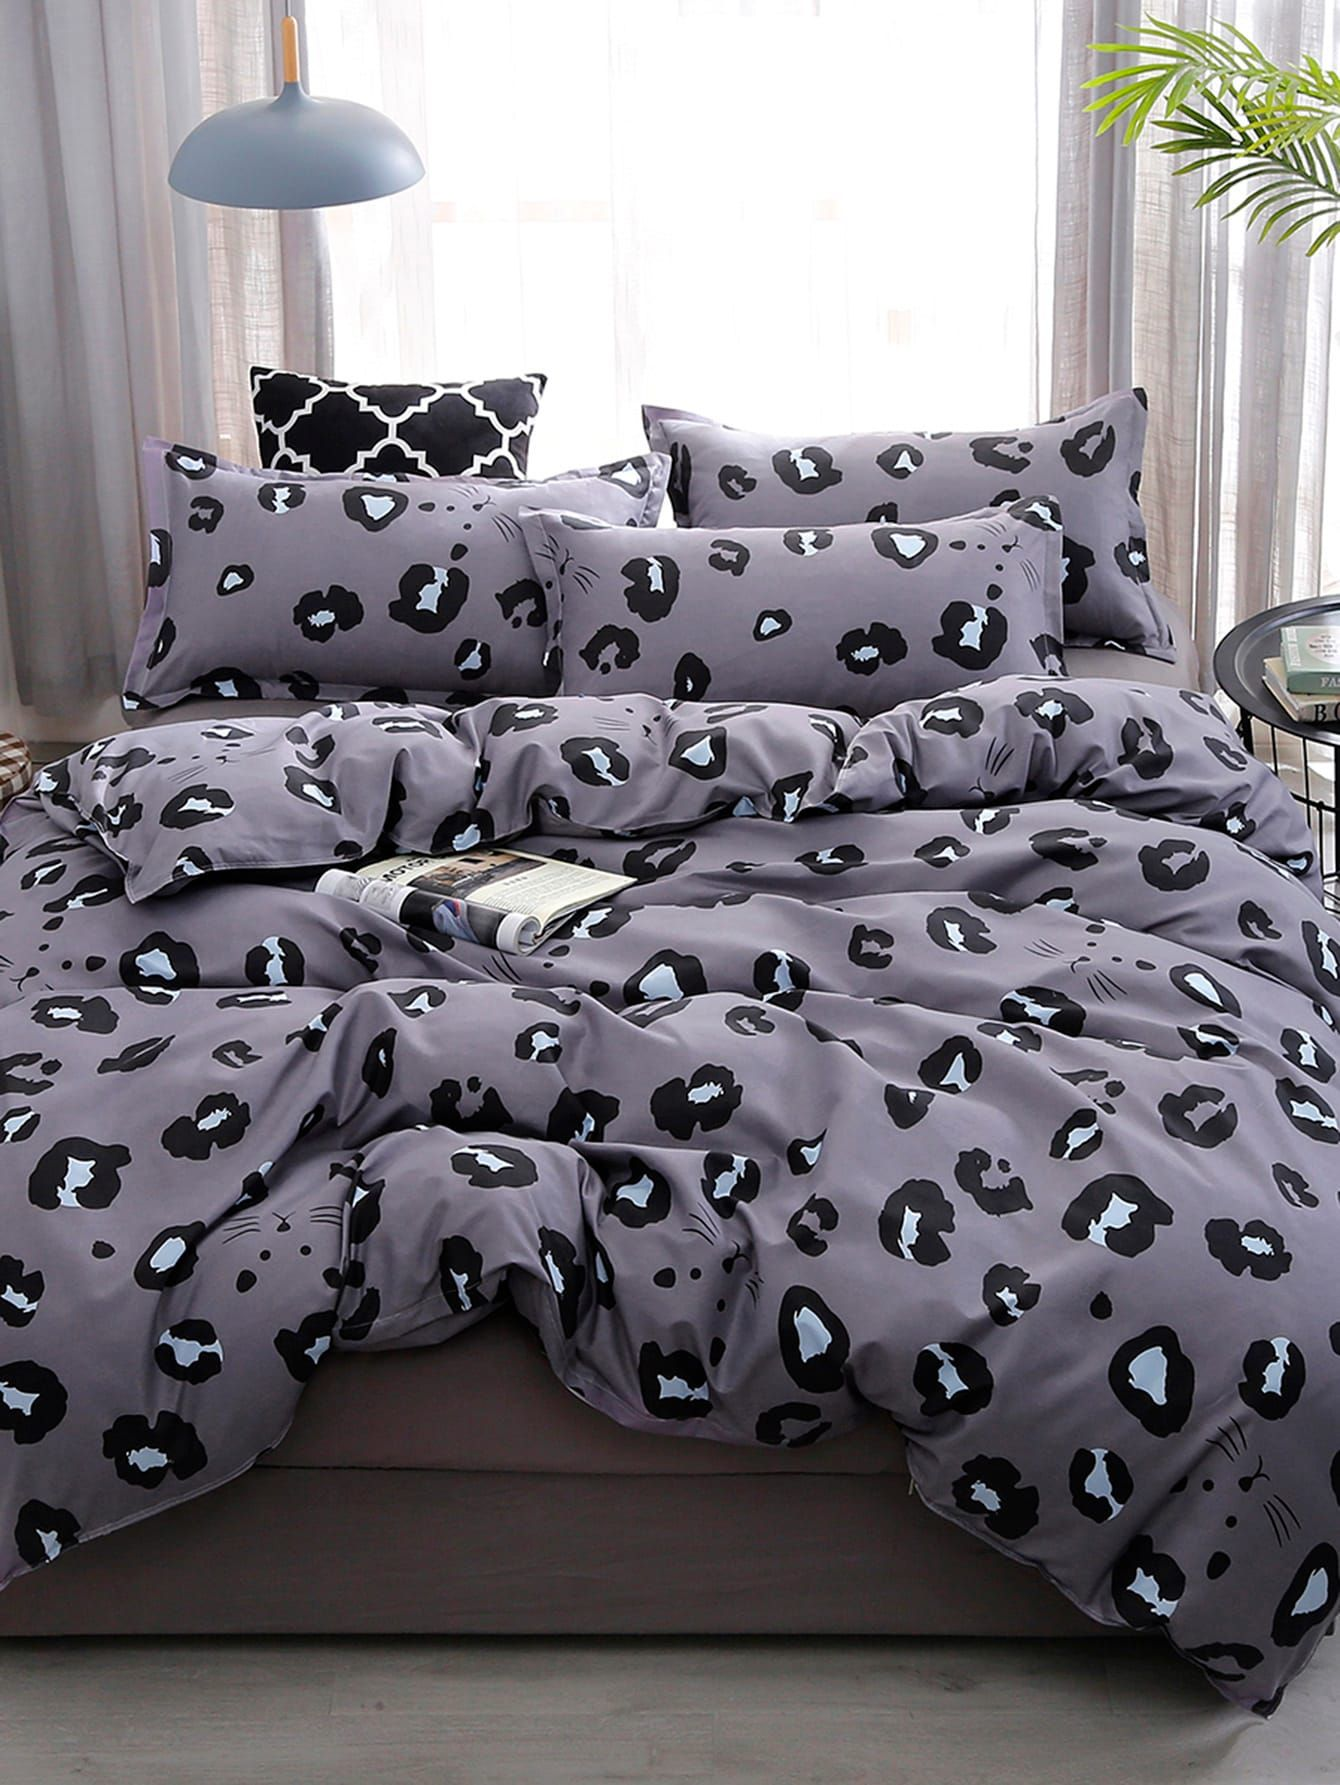 Leopard Print Duvet Cover Bedding Hometextile Bettwaren